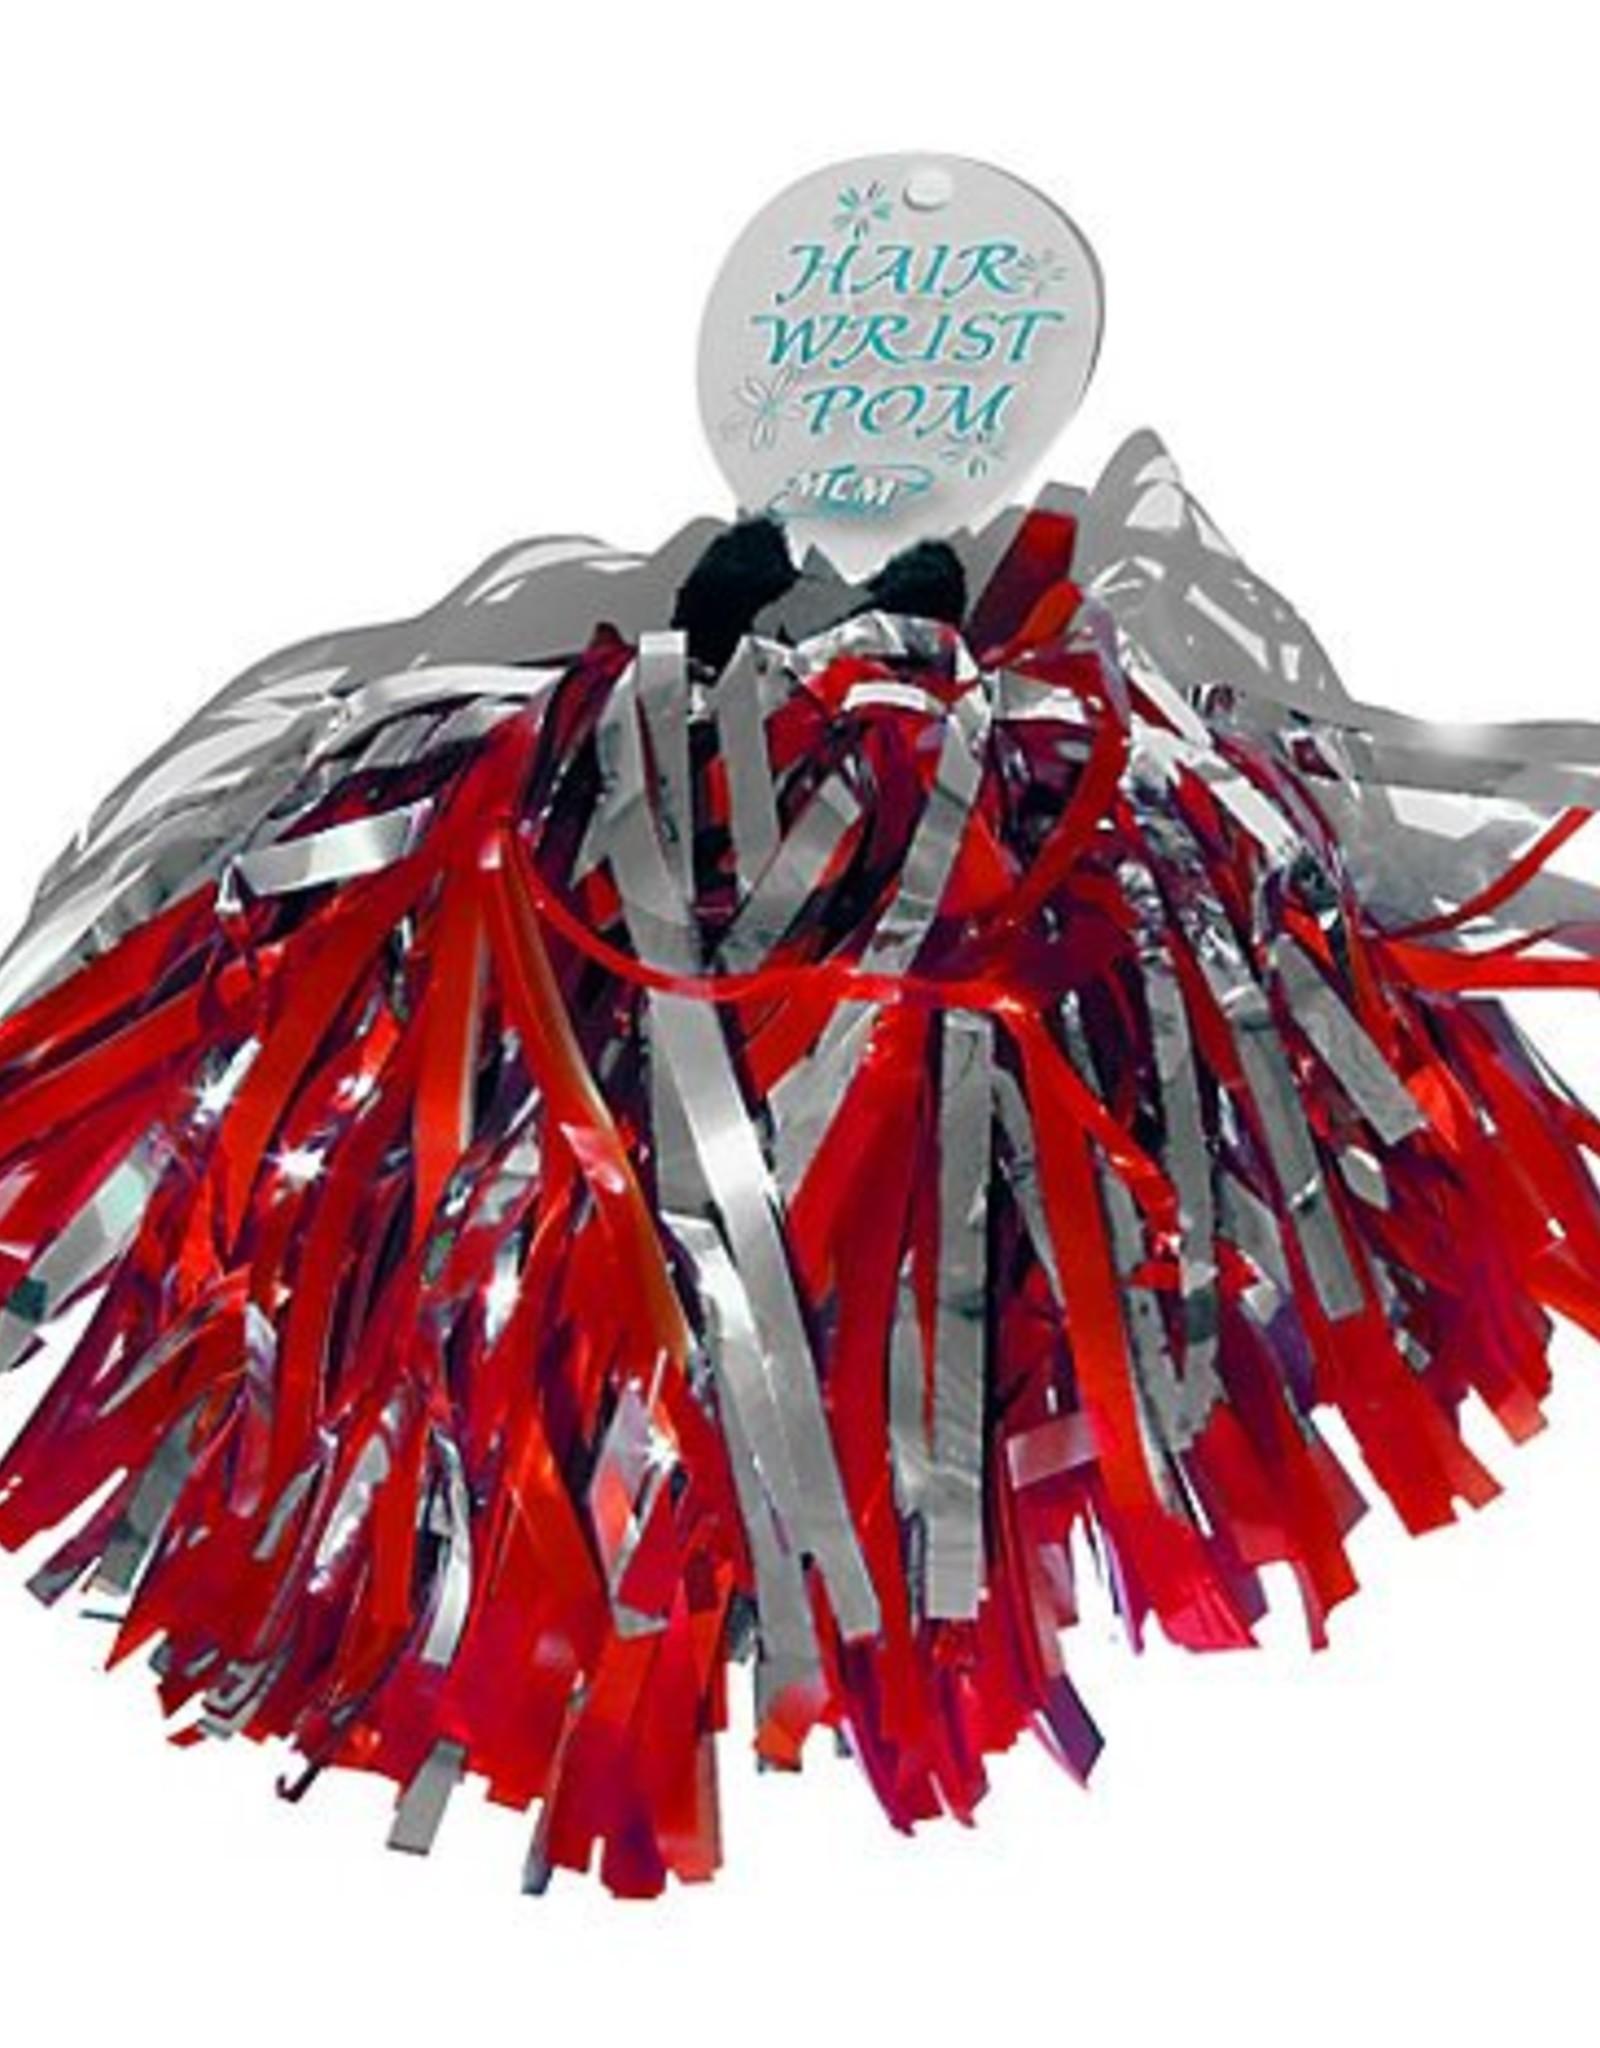 MCM MCM Wrist/Hair Pom red silver